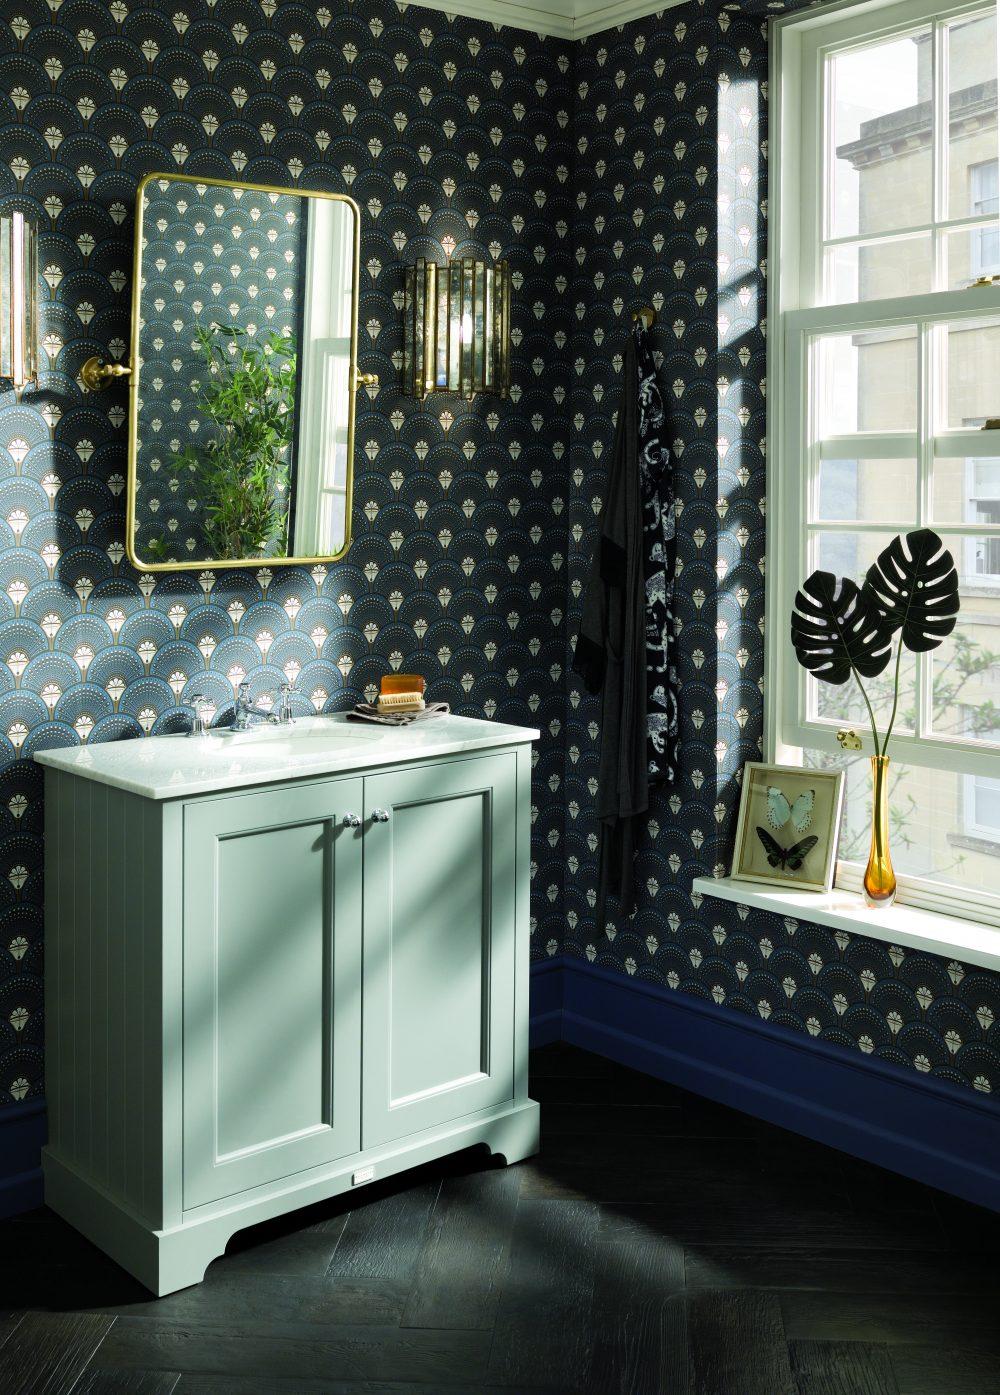 The Plummett Grey 800 Furniture Unit with Divine Savages Wallpaper - Deco Martini